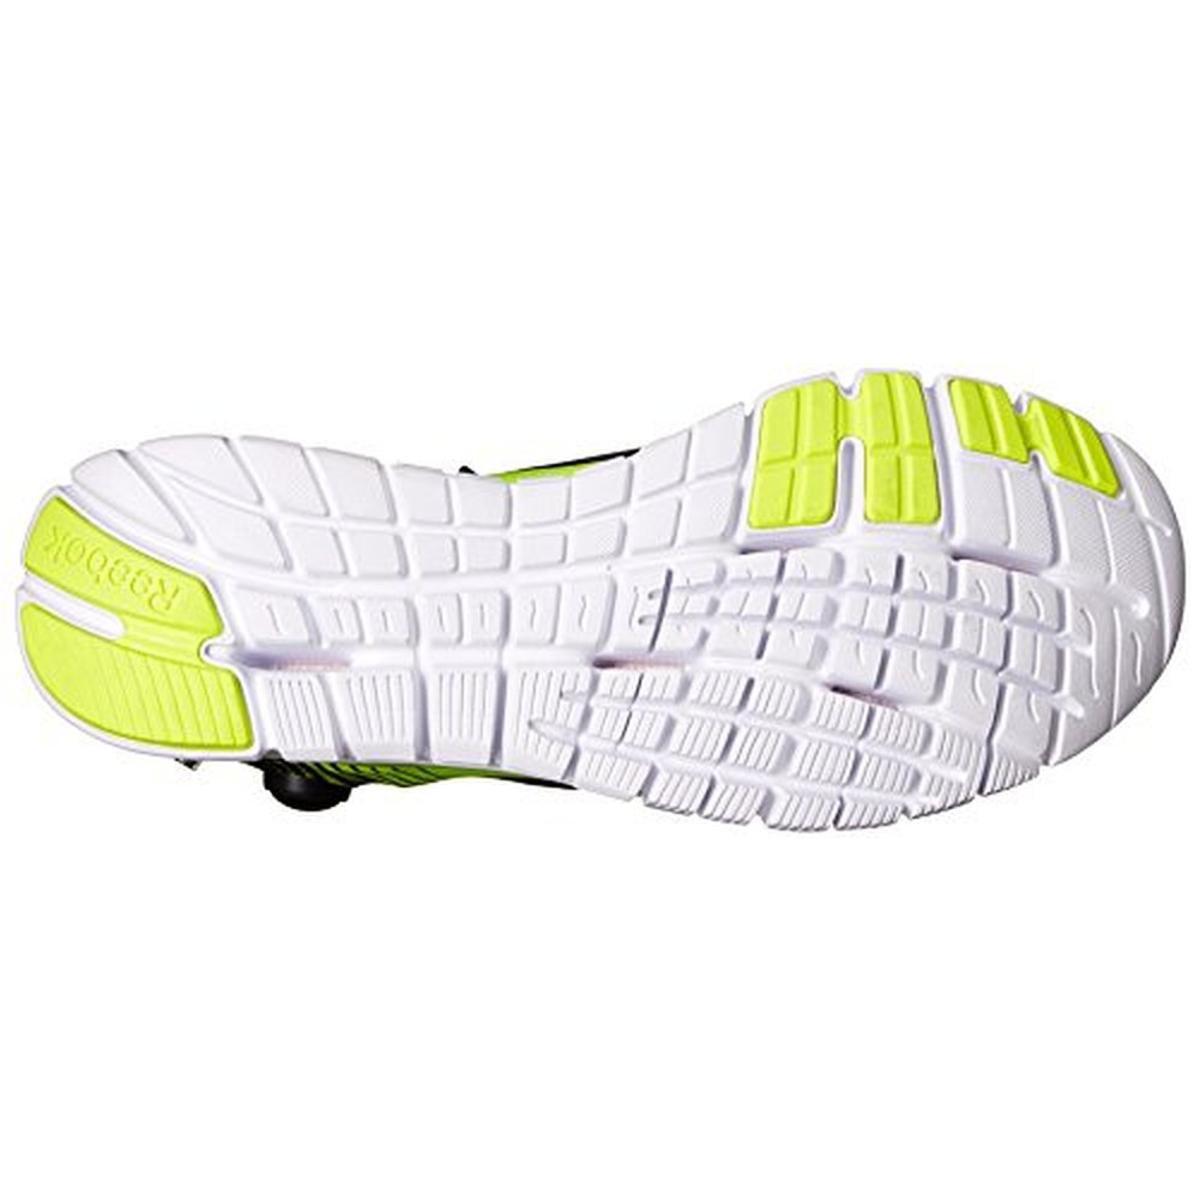 Reebok Womens ZPump Fusion Mesh Trainers Running Shoes